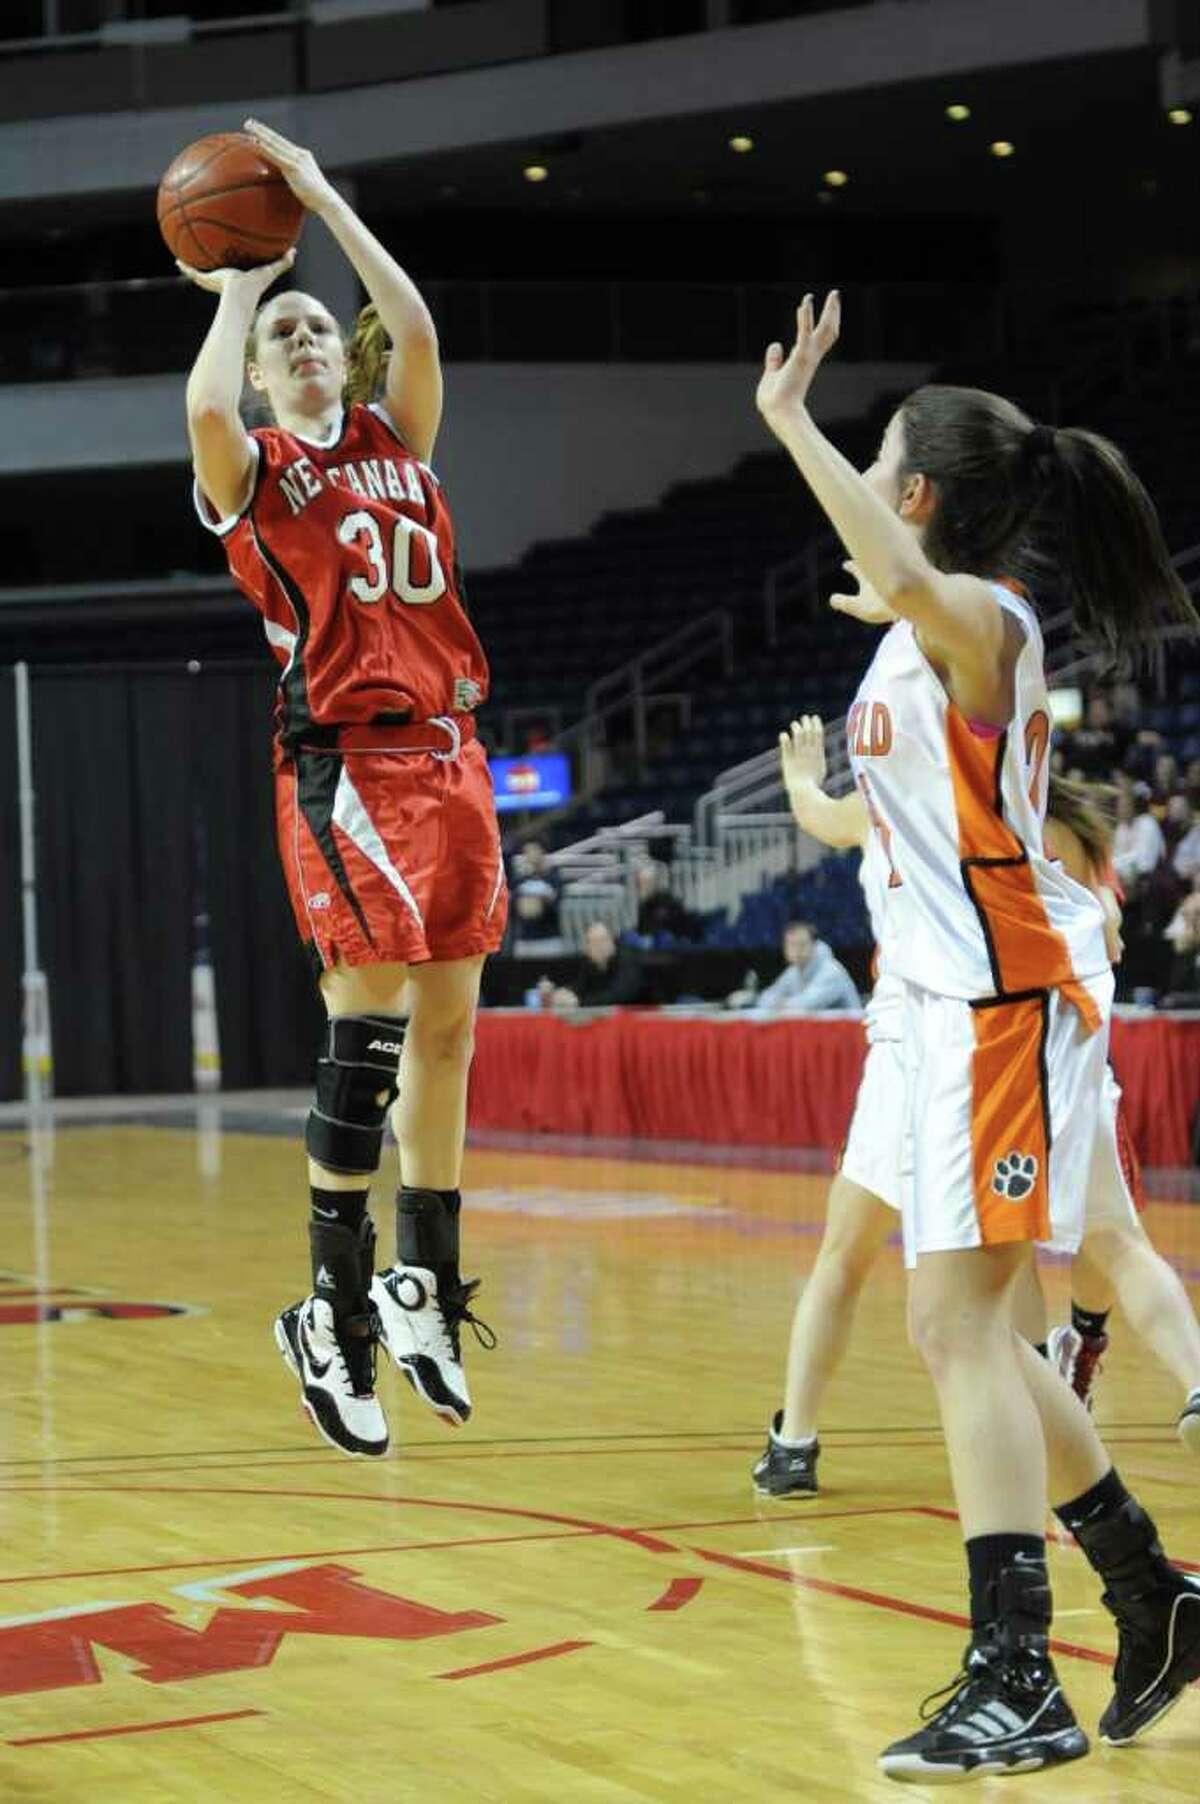 New Canaan's Melissa Tweed takes a shot during Tuesday's FCIAC girls basketball semifinal game at the Webster Bank Arena at Harbor Yard on Feburary 22, 2011.